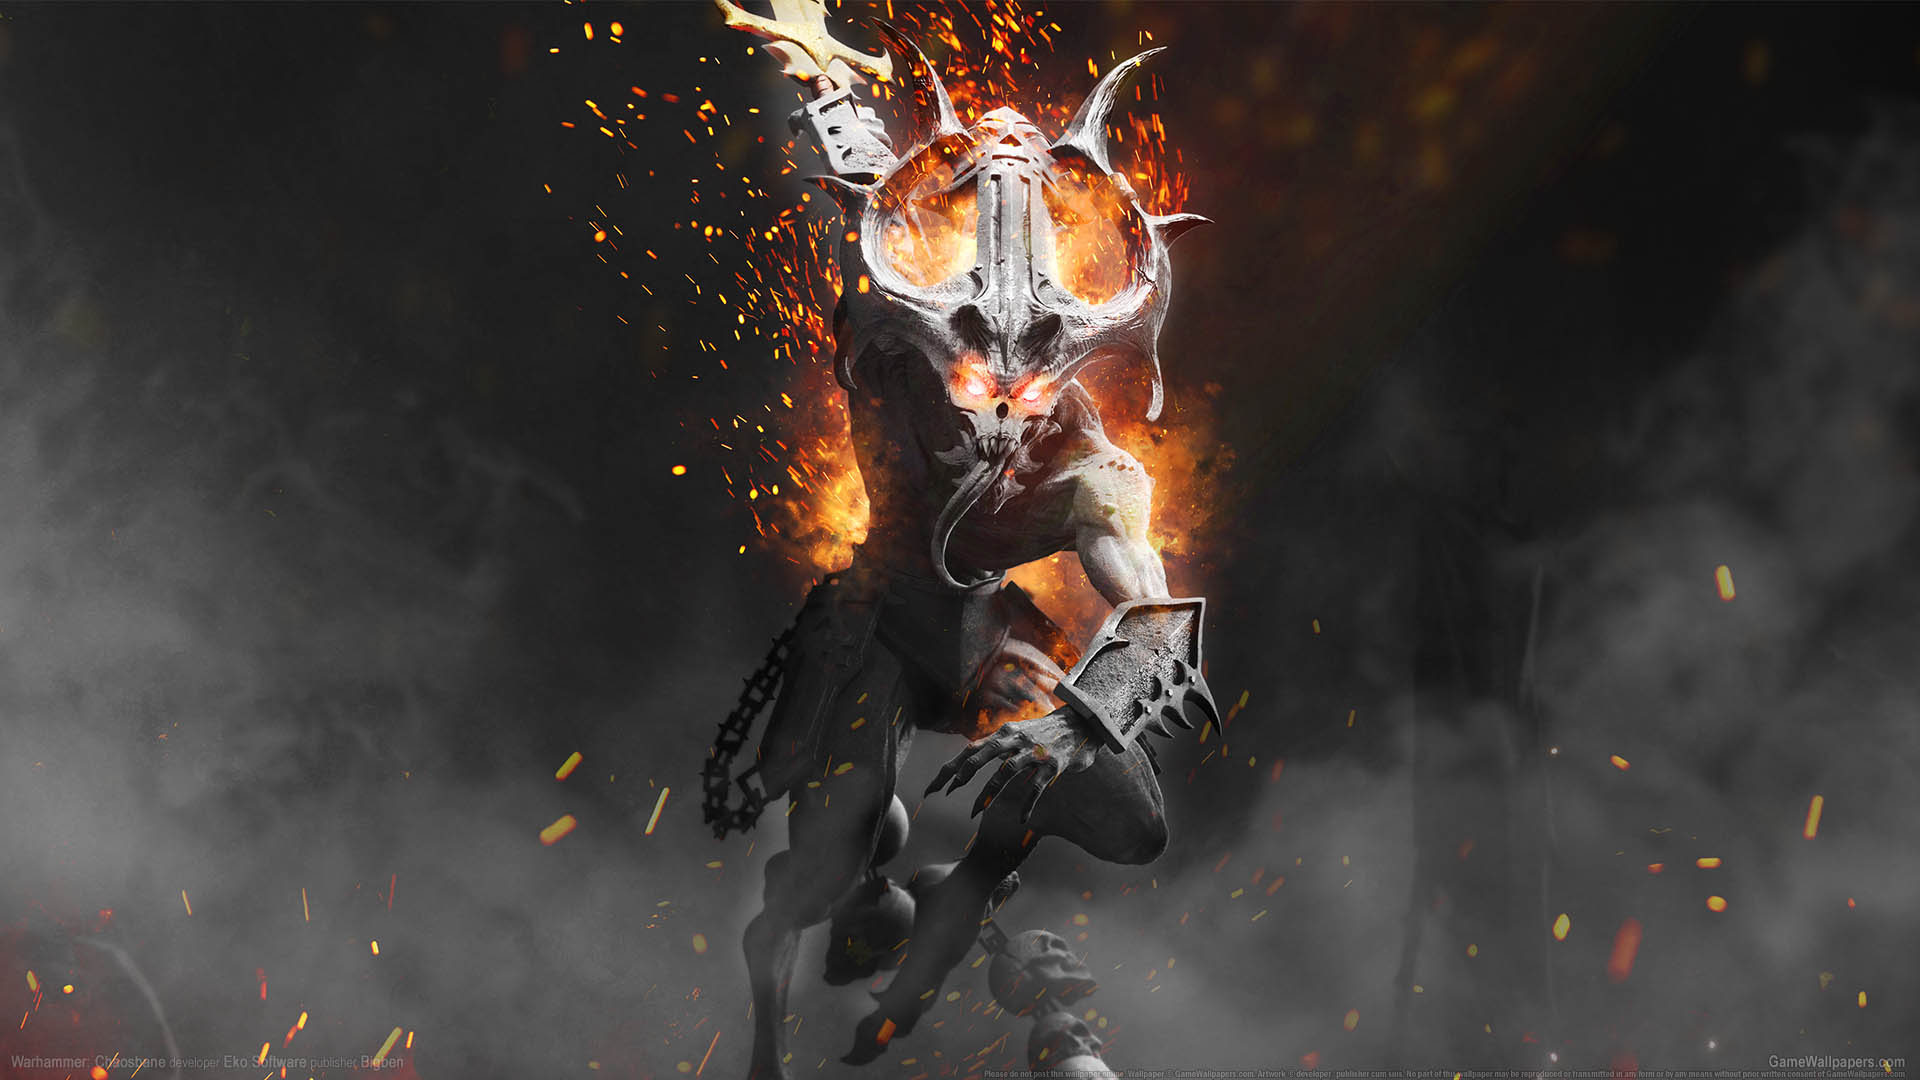 Warhammer: Chaosbane wallpaper 03 1920x1080